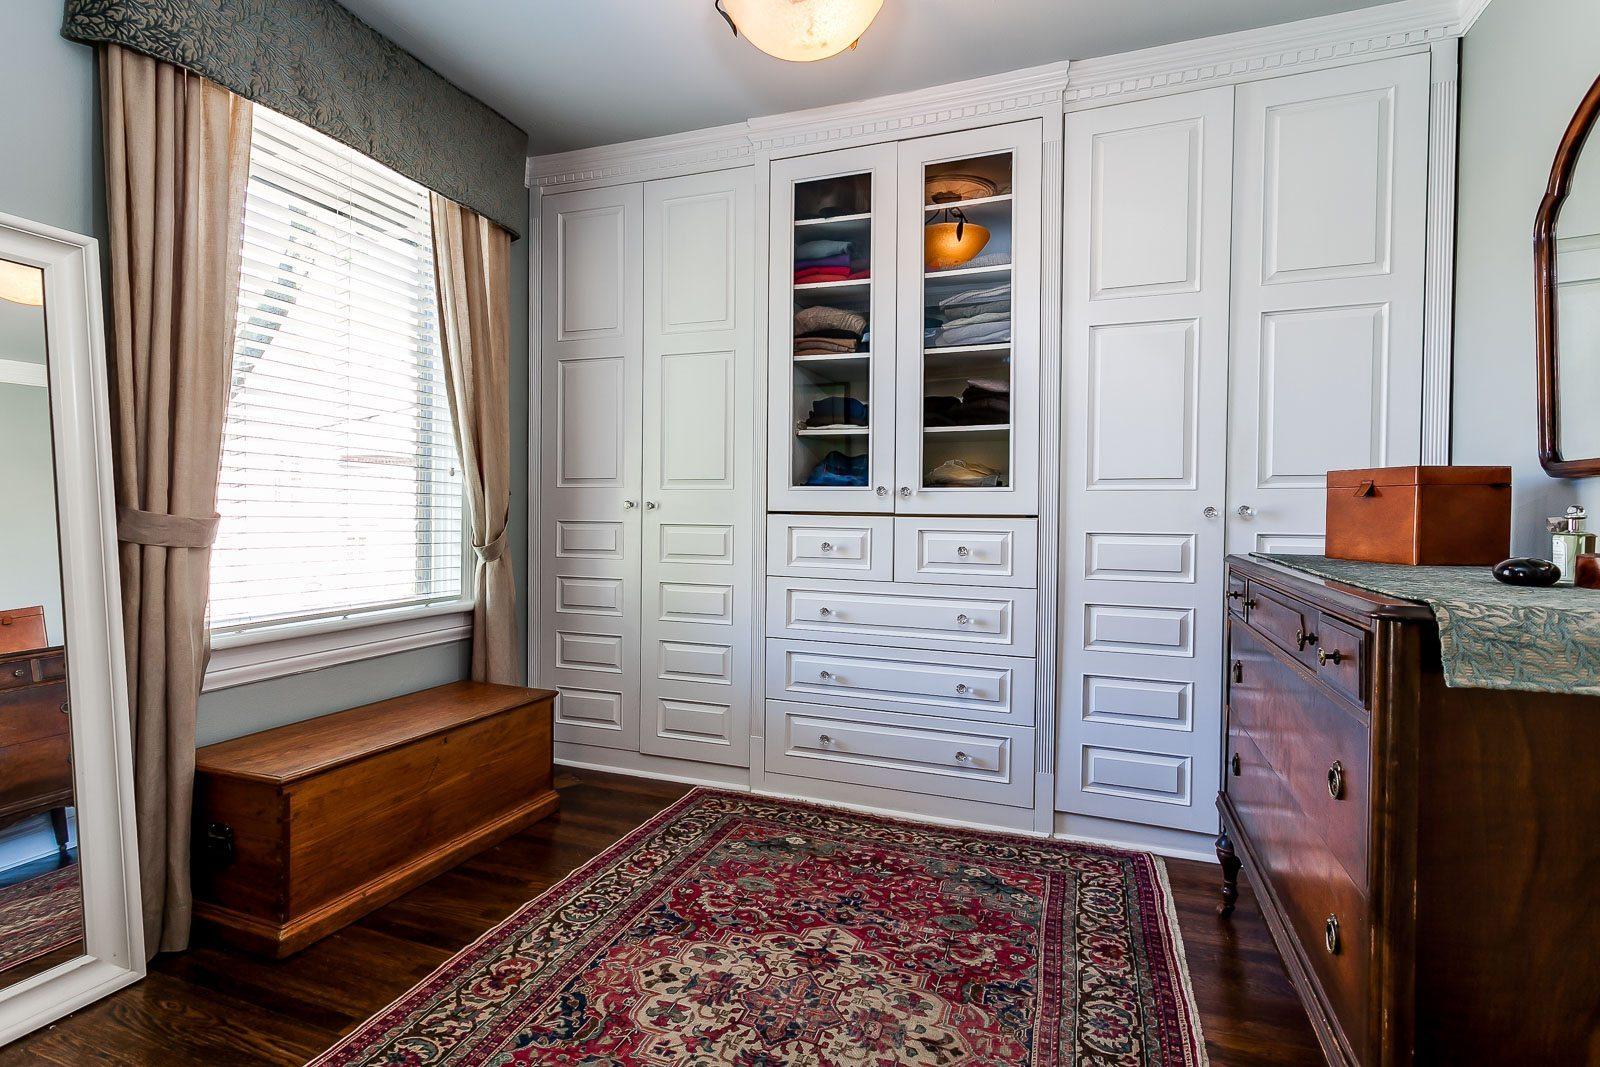 toronto-house-sold-223-wright-avenue-9